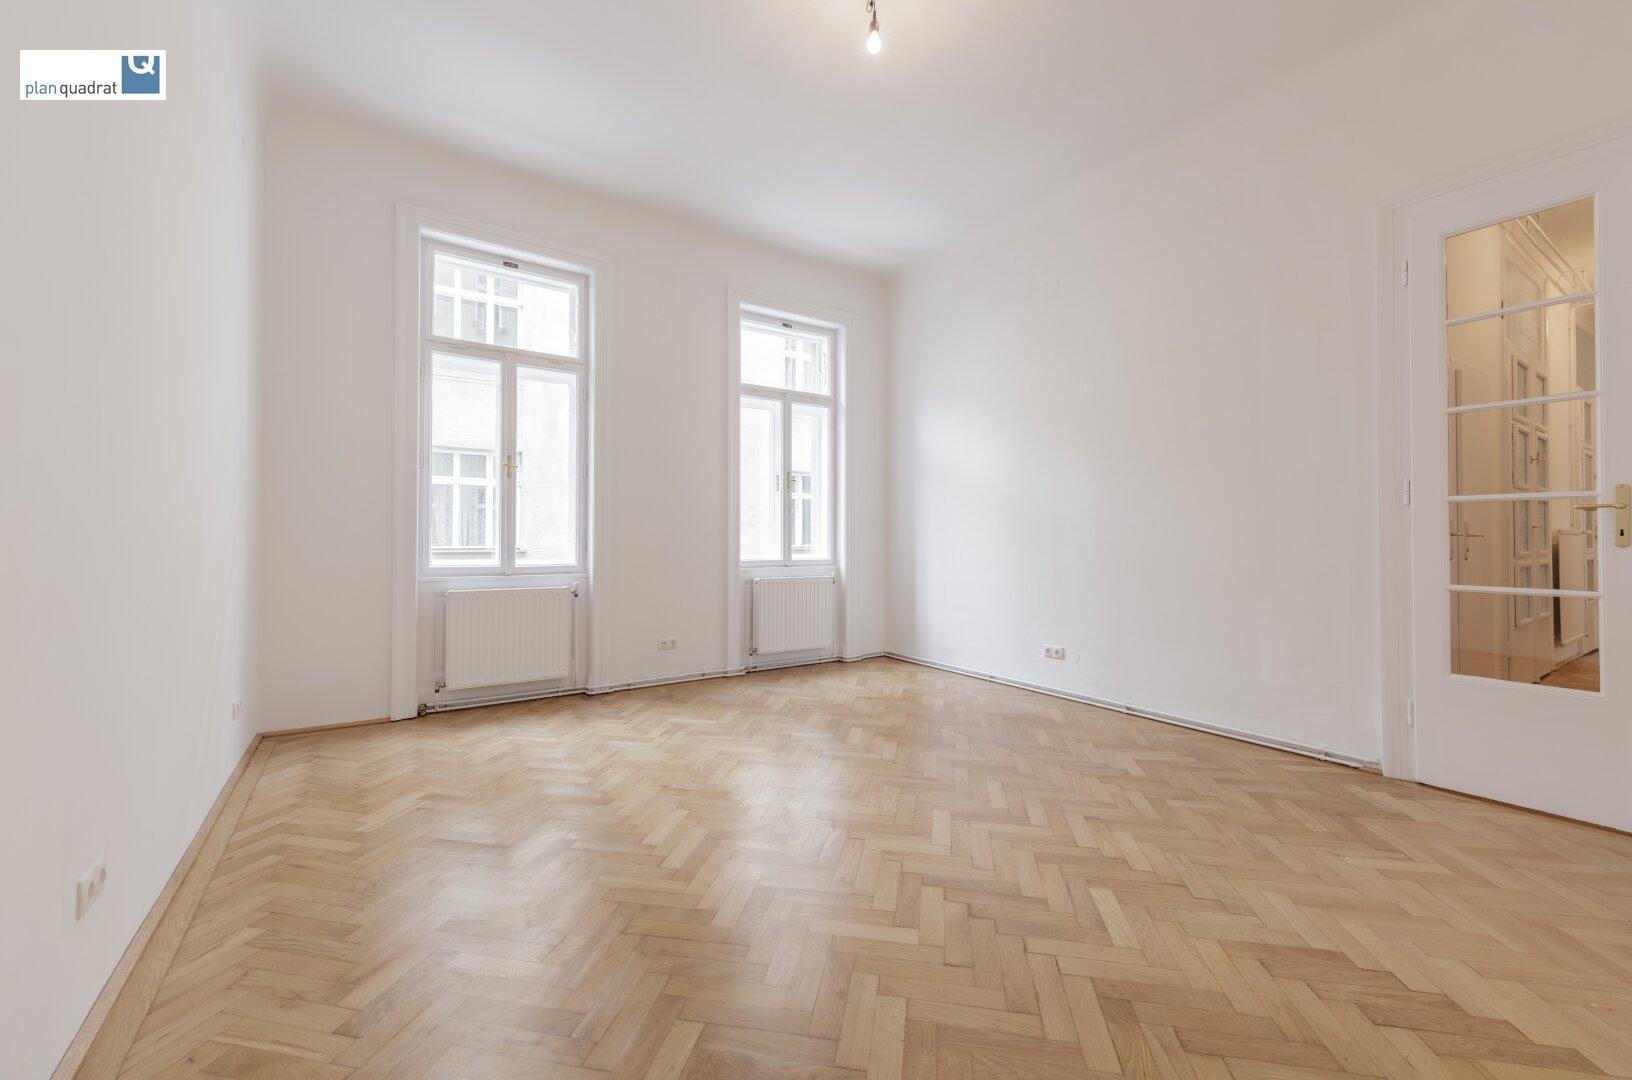 Büroraum 5 (gem. Grundriss - ca. 22,30 qm)